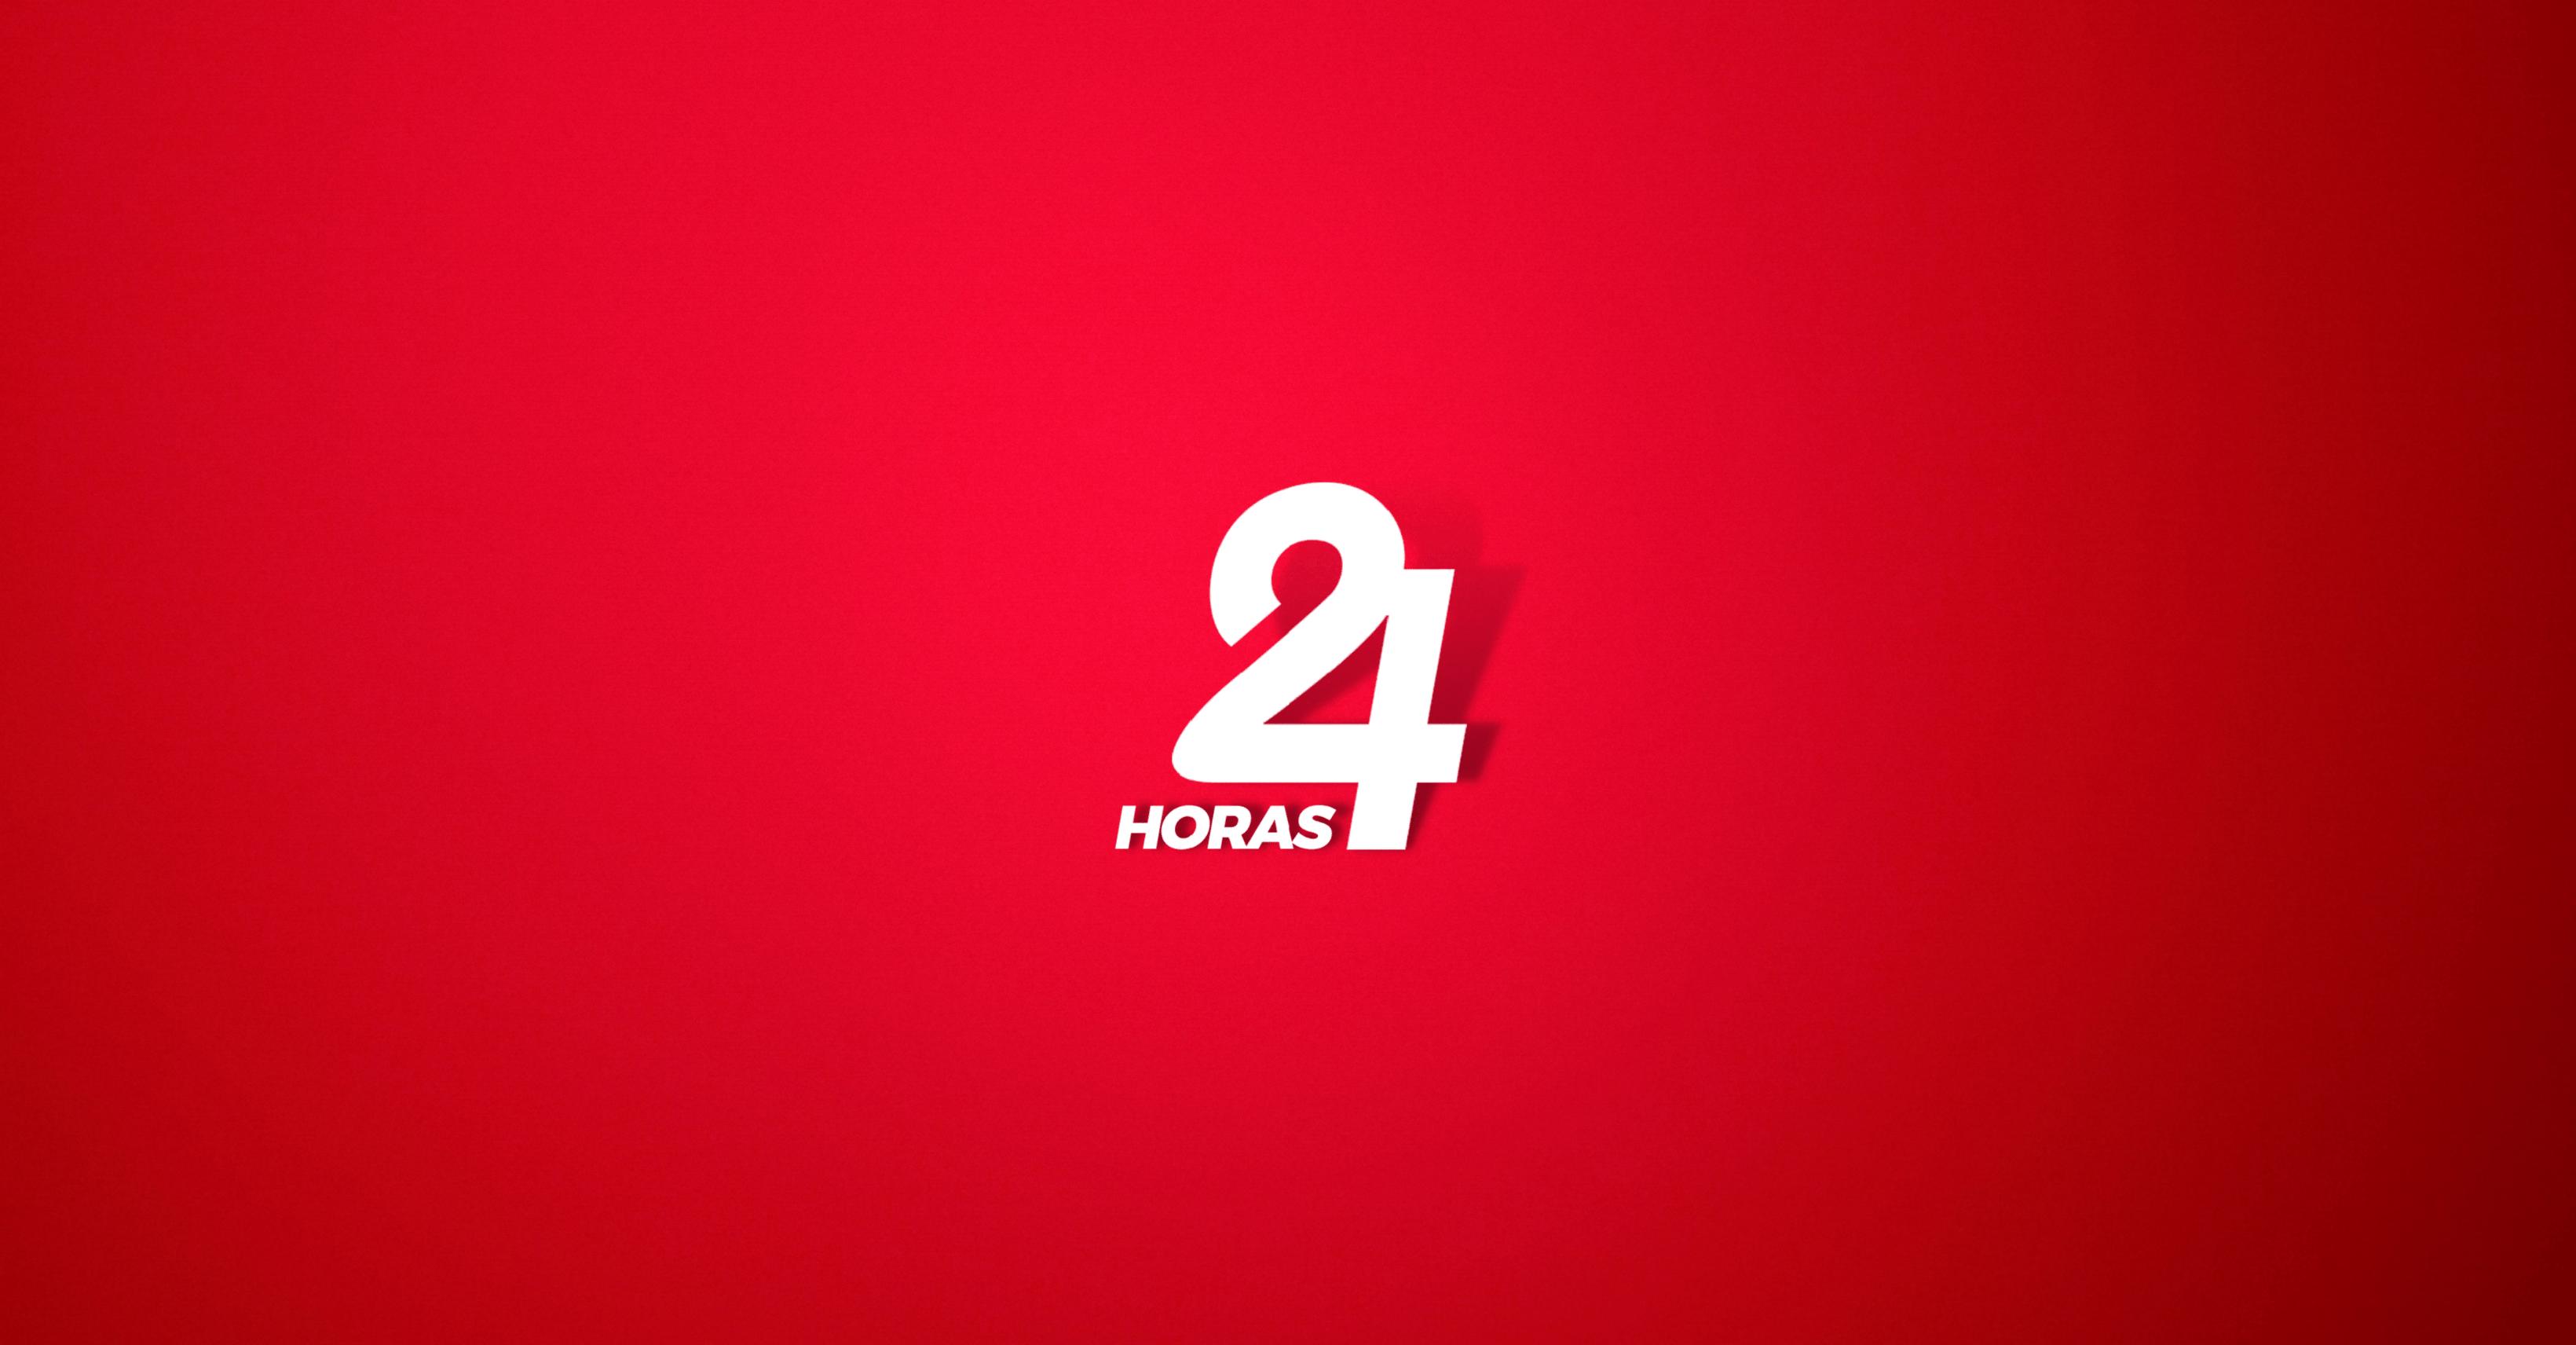 24horas_fundo_portal24h